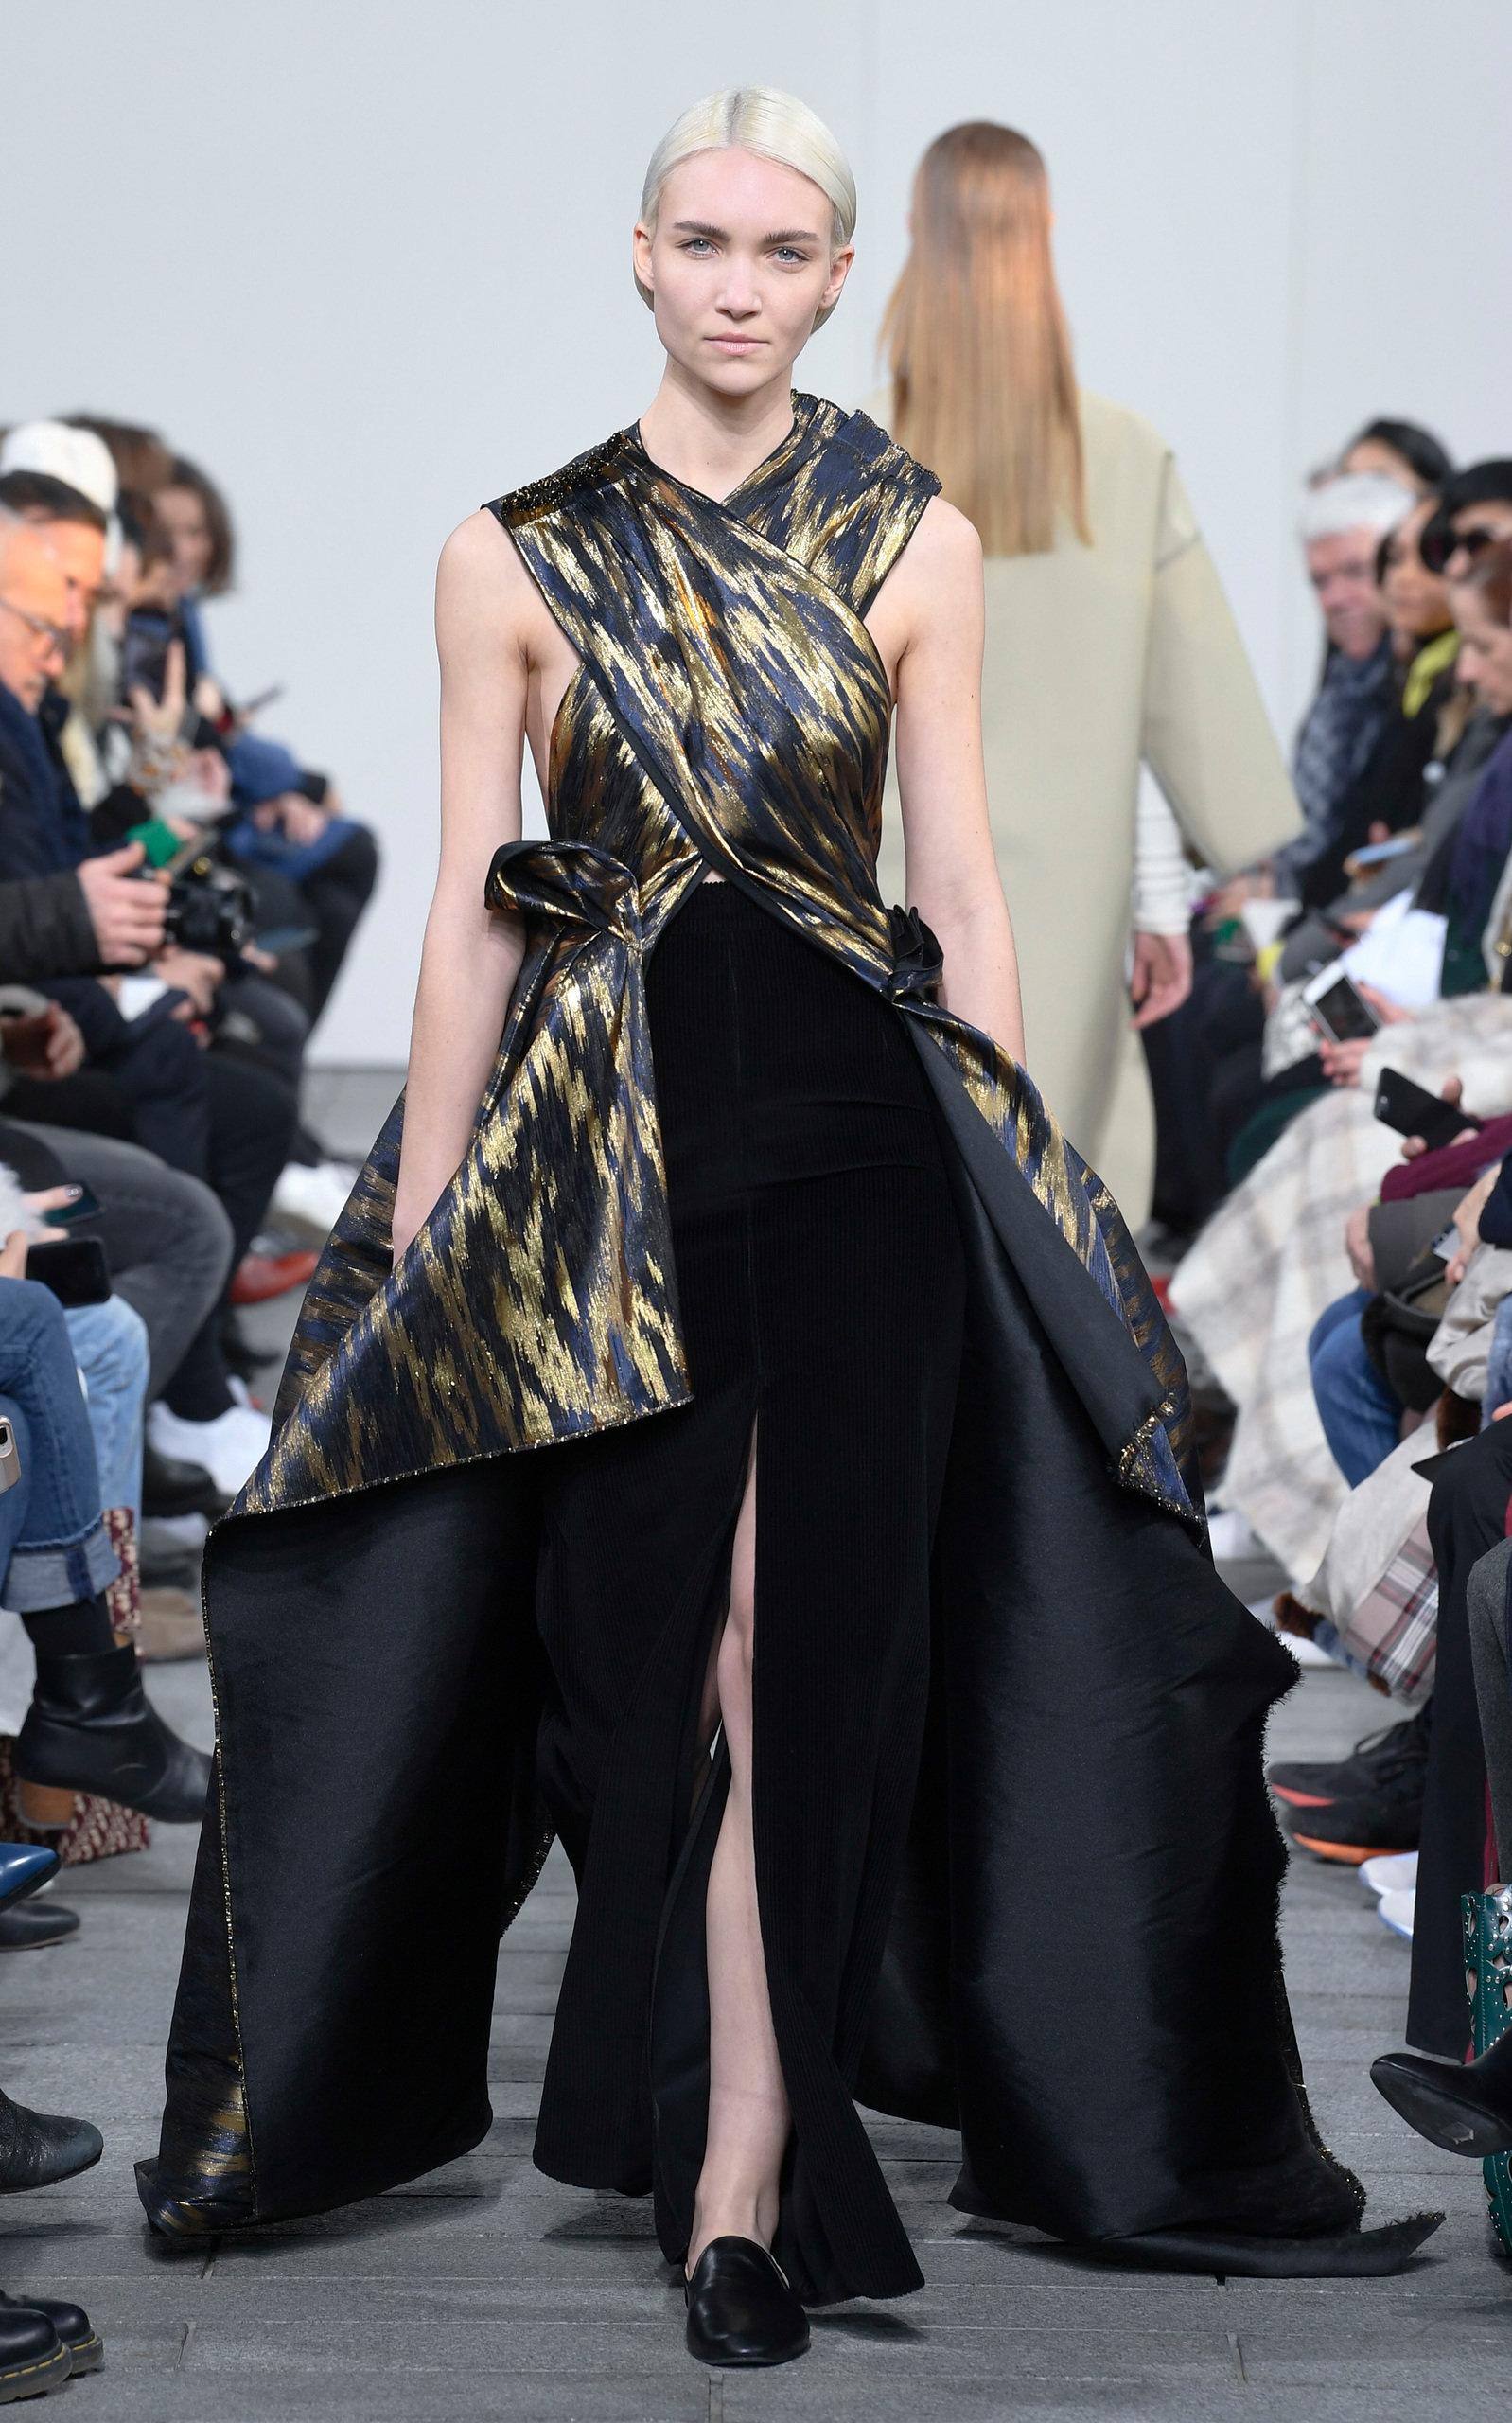 399bf4f9a Metallic Cross Top Dress by Maison Rabih Kayrouz | Moda Operandi